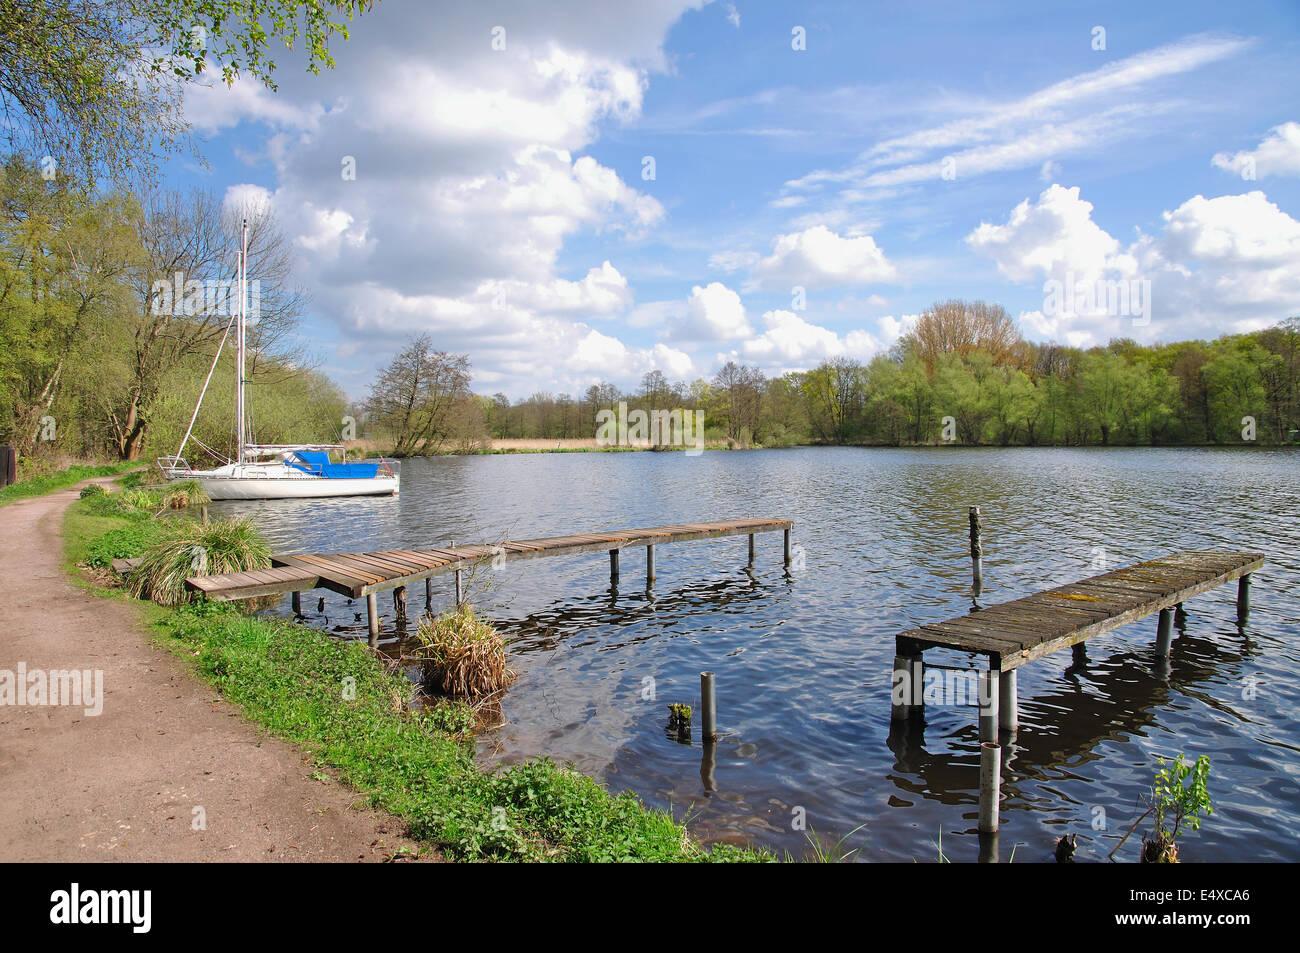 Lake DeWitt,Lower Rhine,Germany - Stock Image